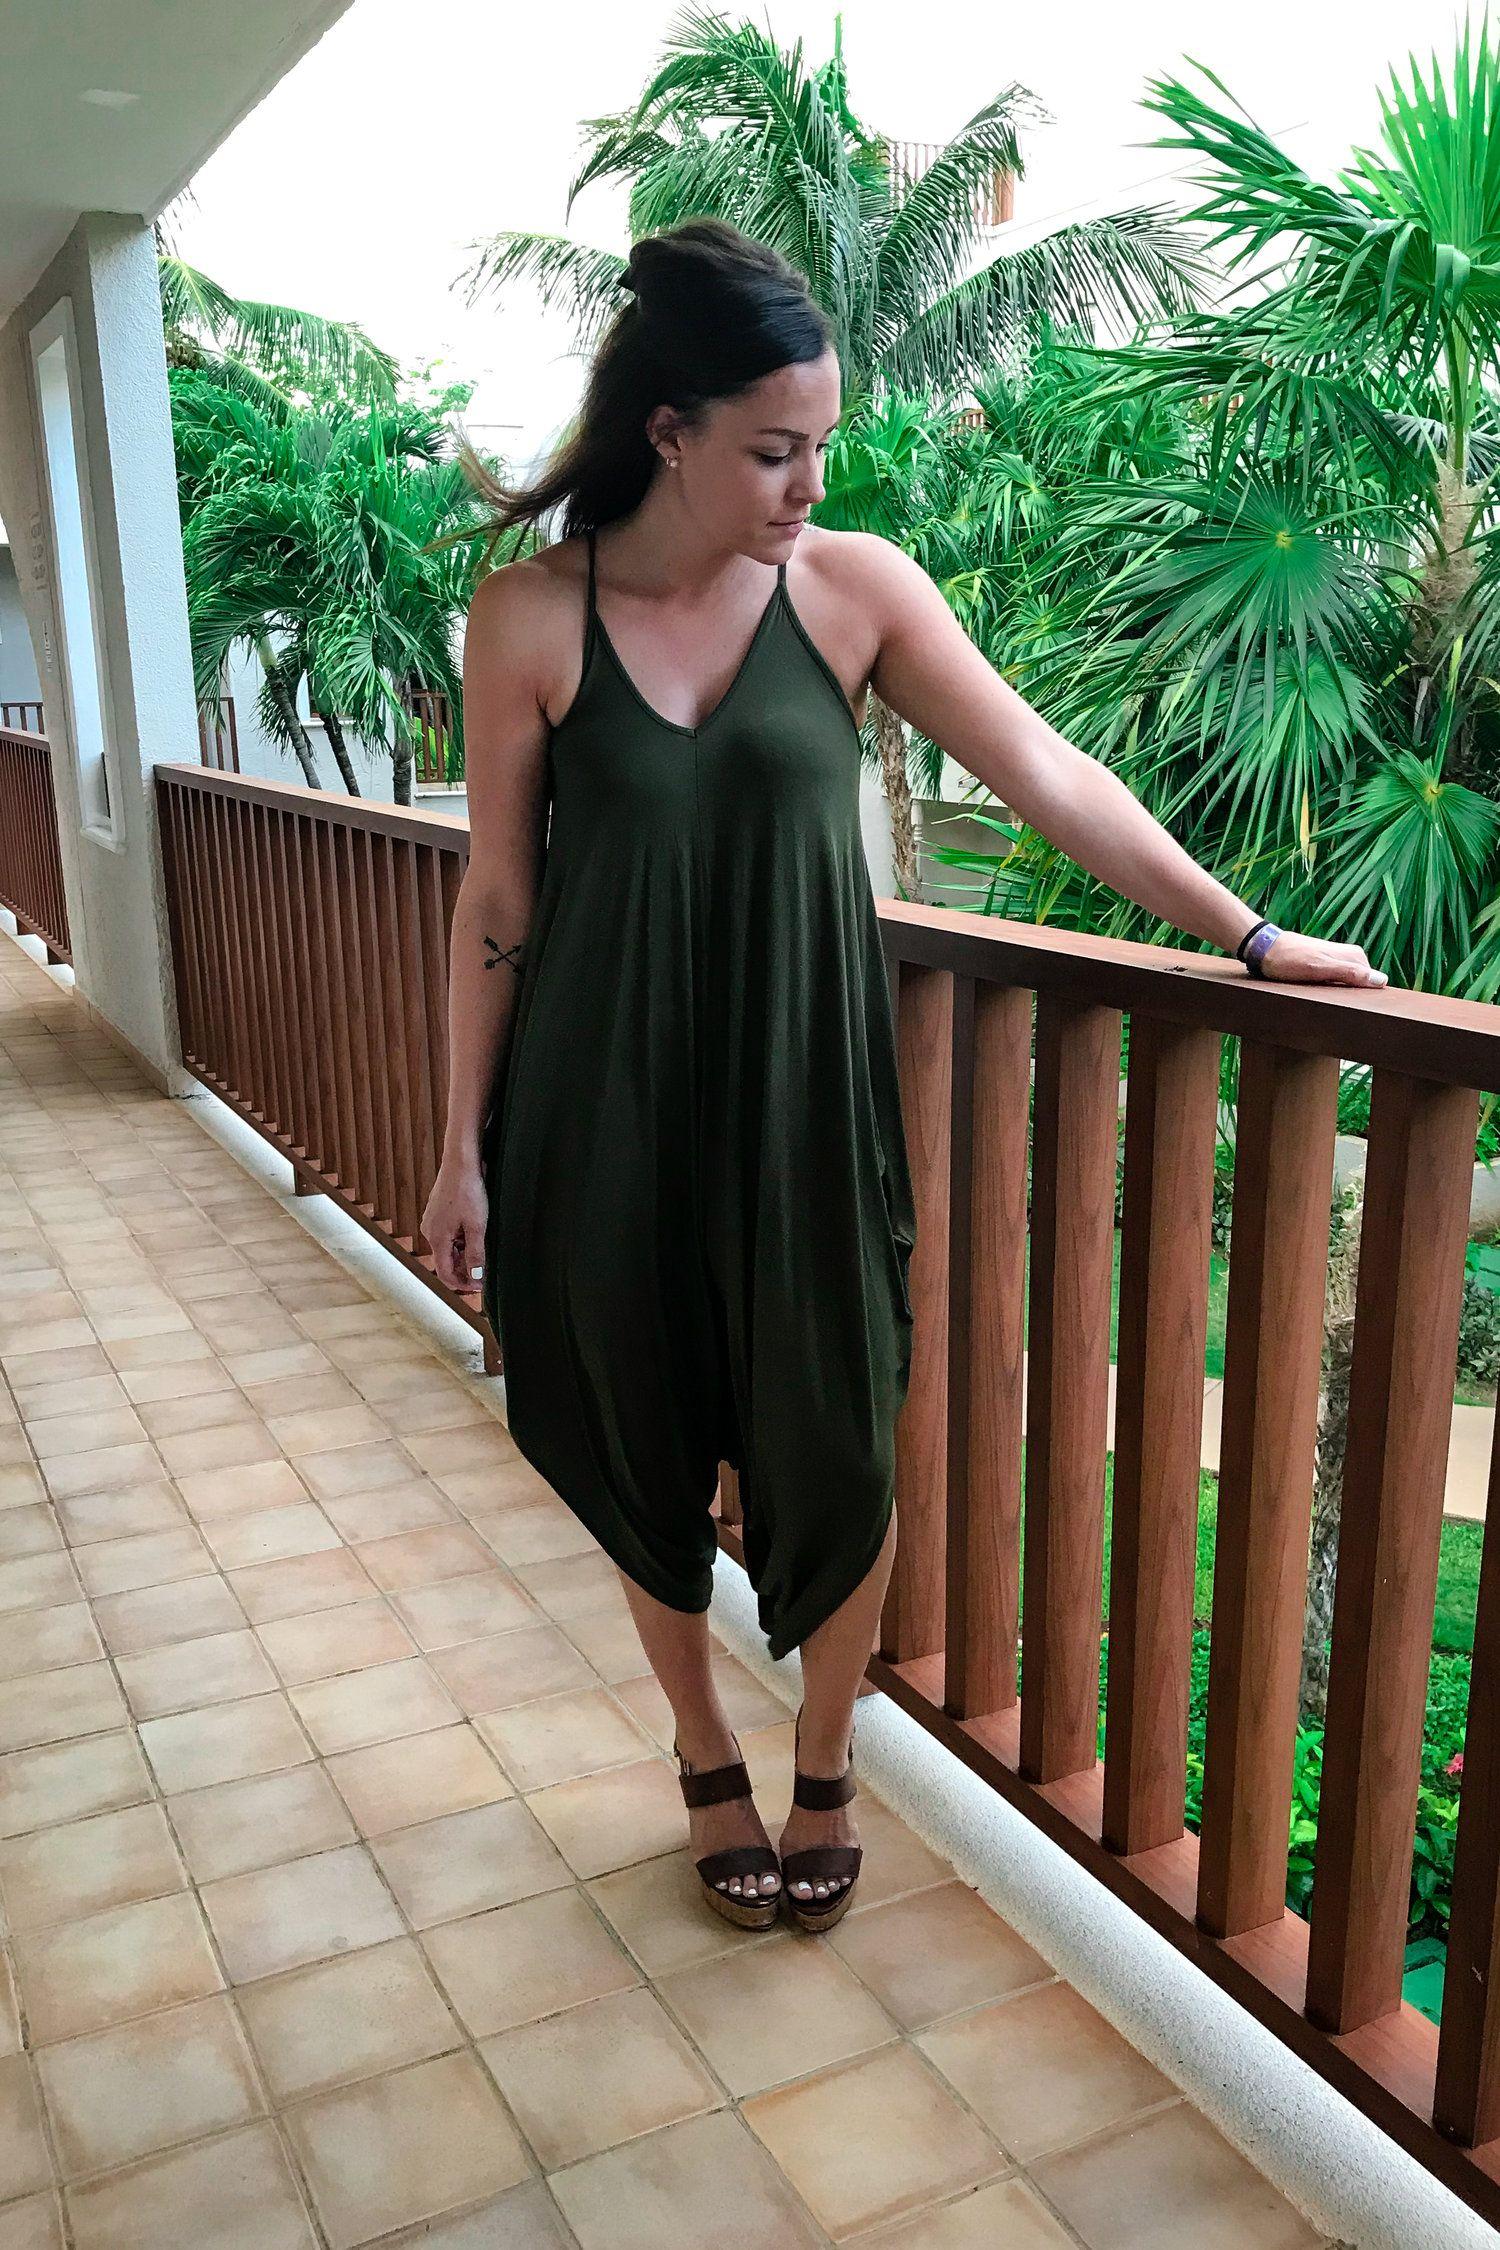 e2554359a65 Olive Green Maxi Dress Pinterest - Gomes Weine AG